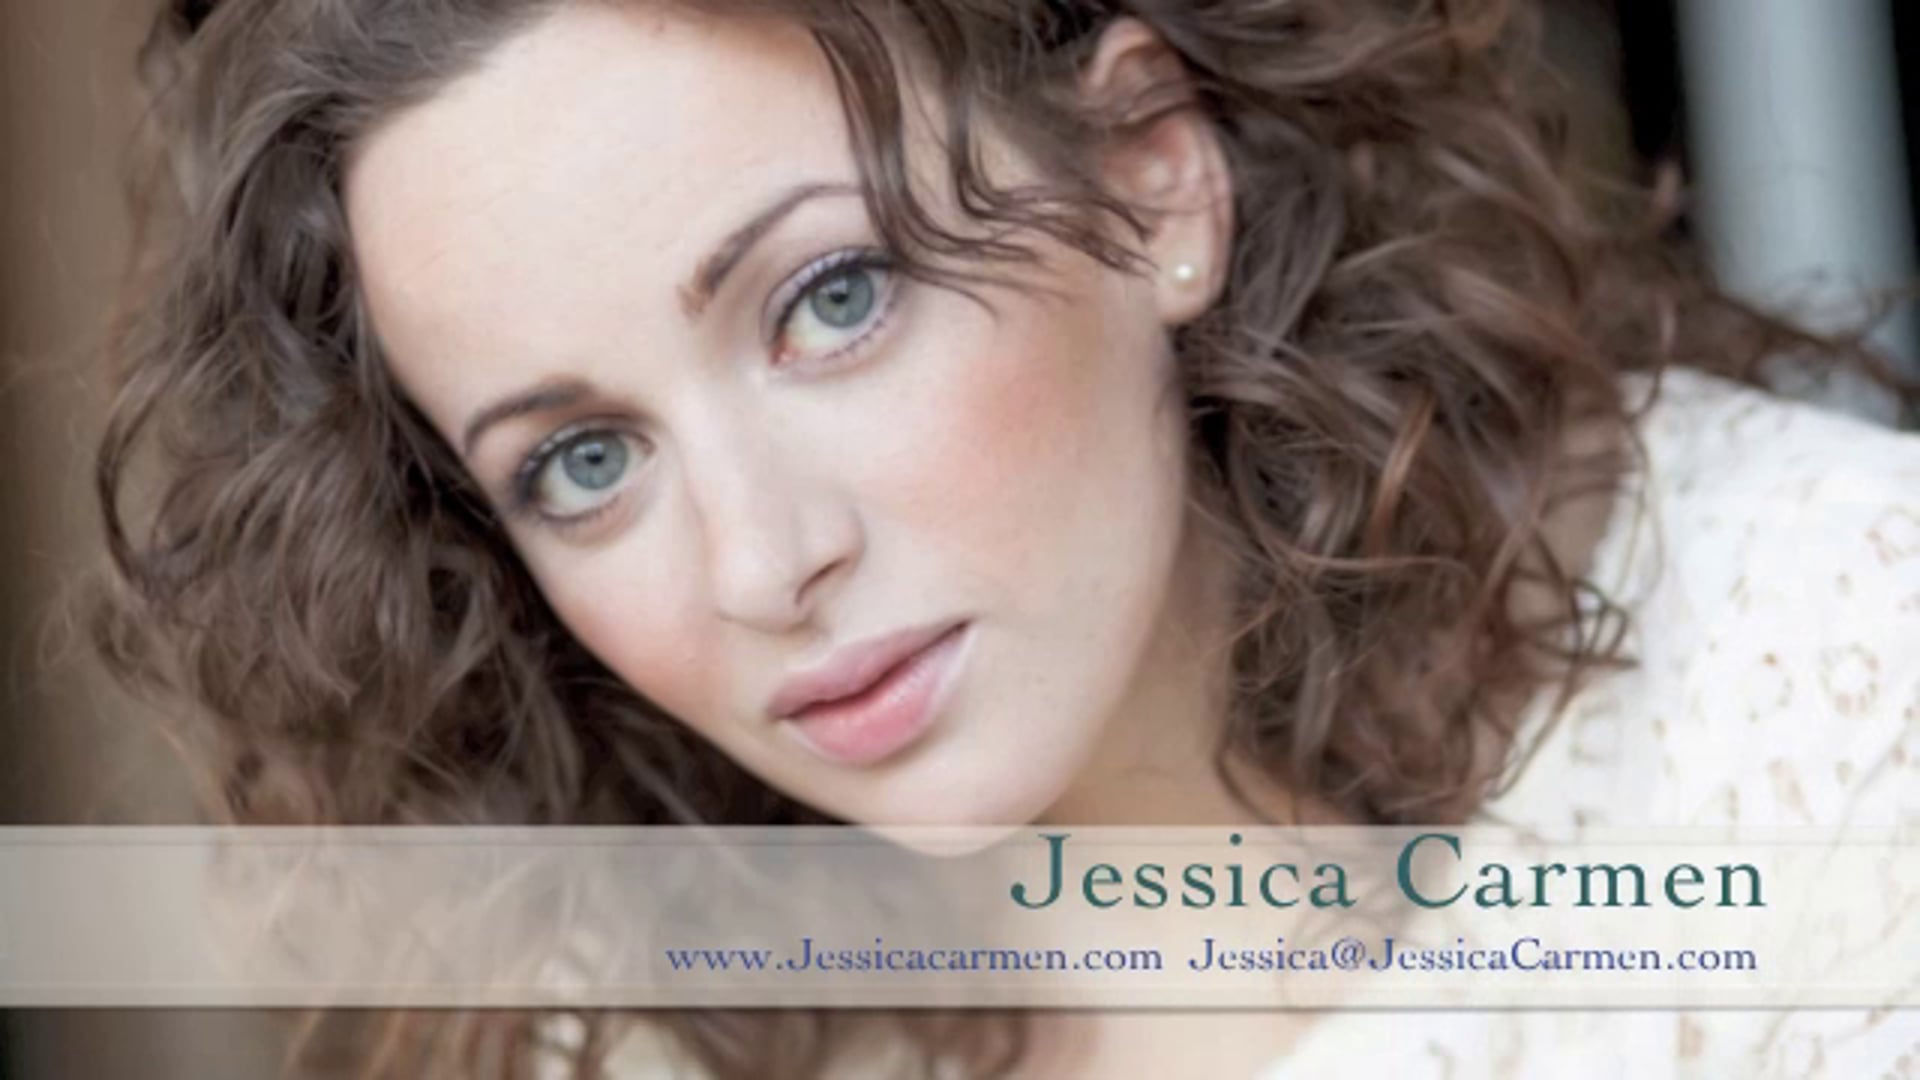 Jessica Carmen Reel